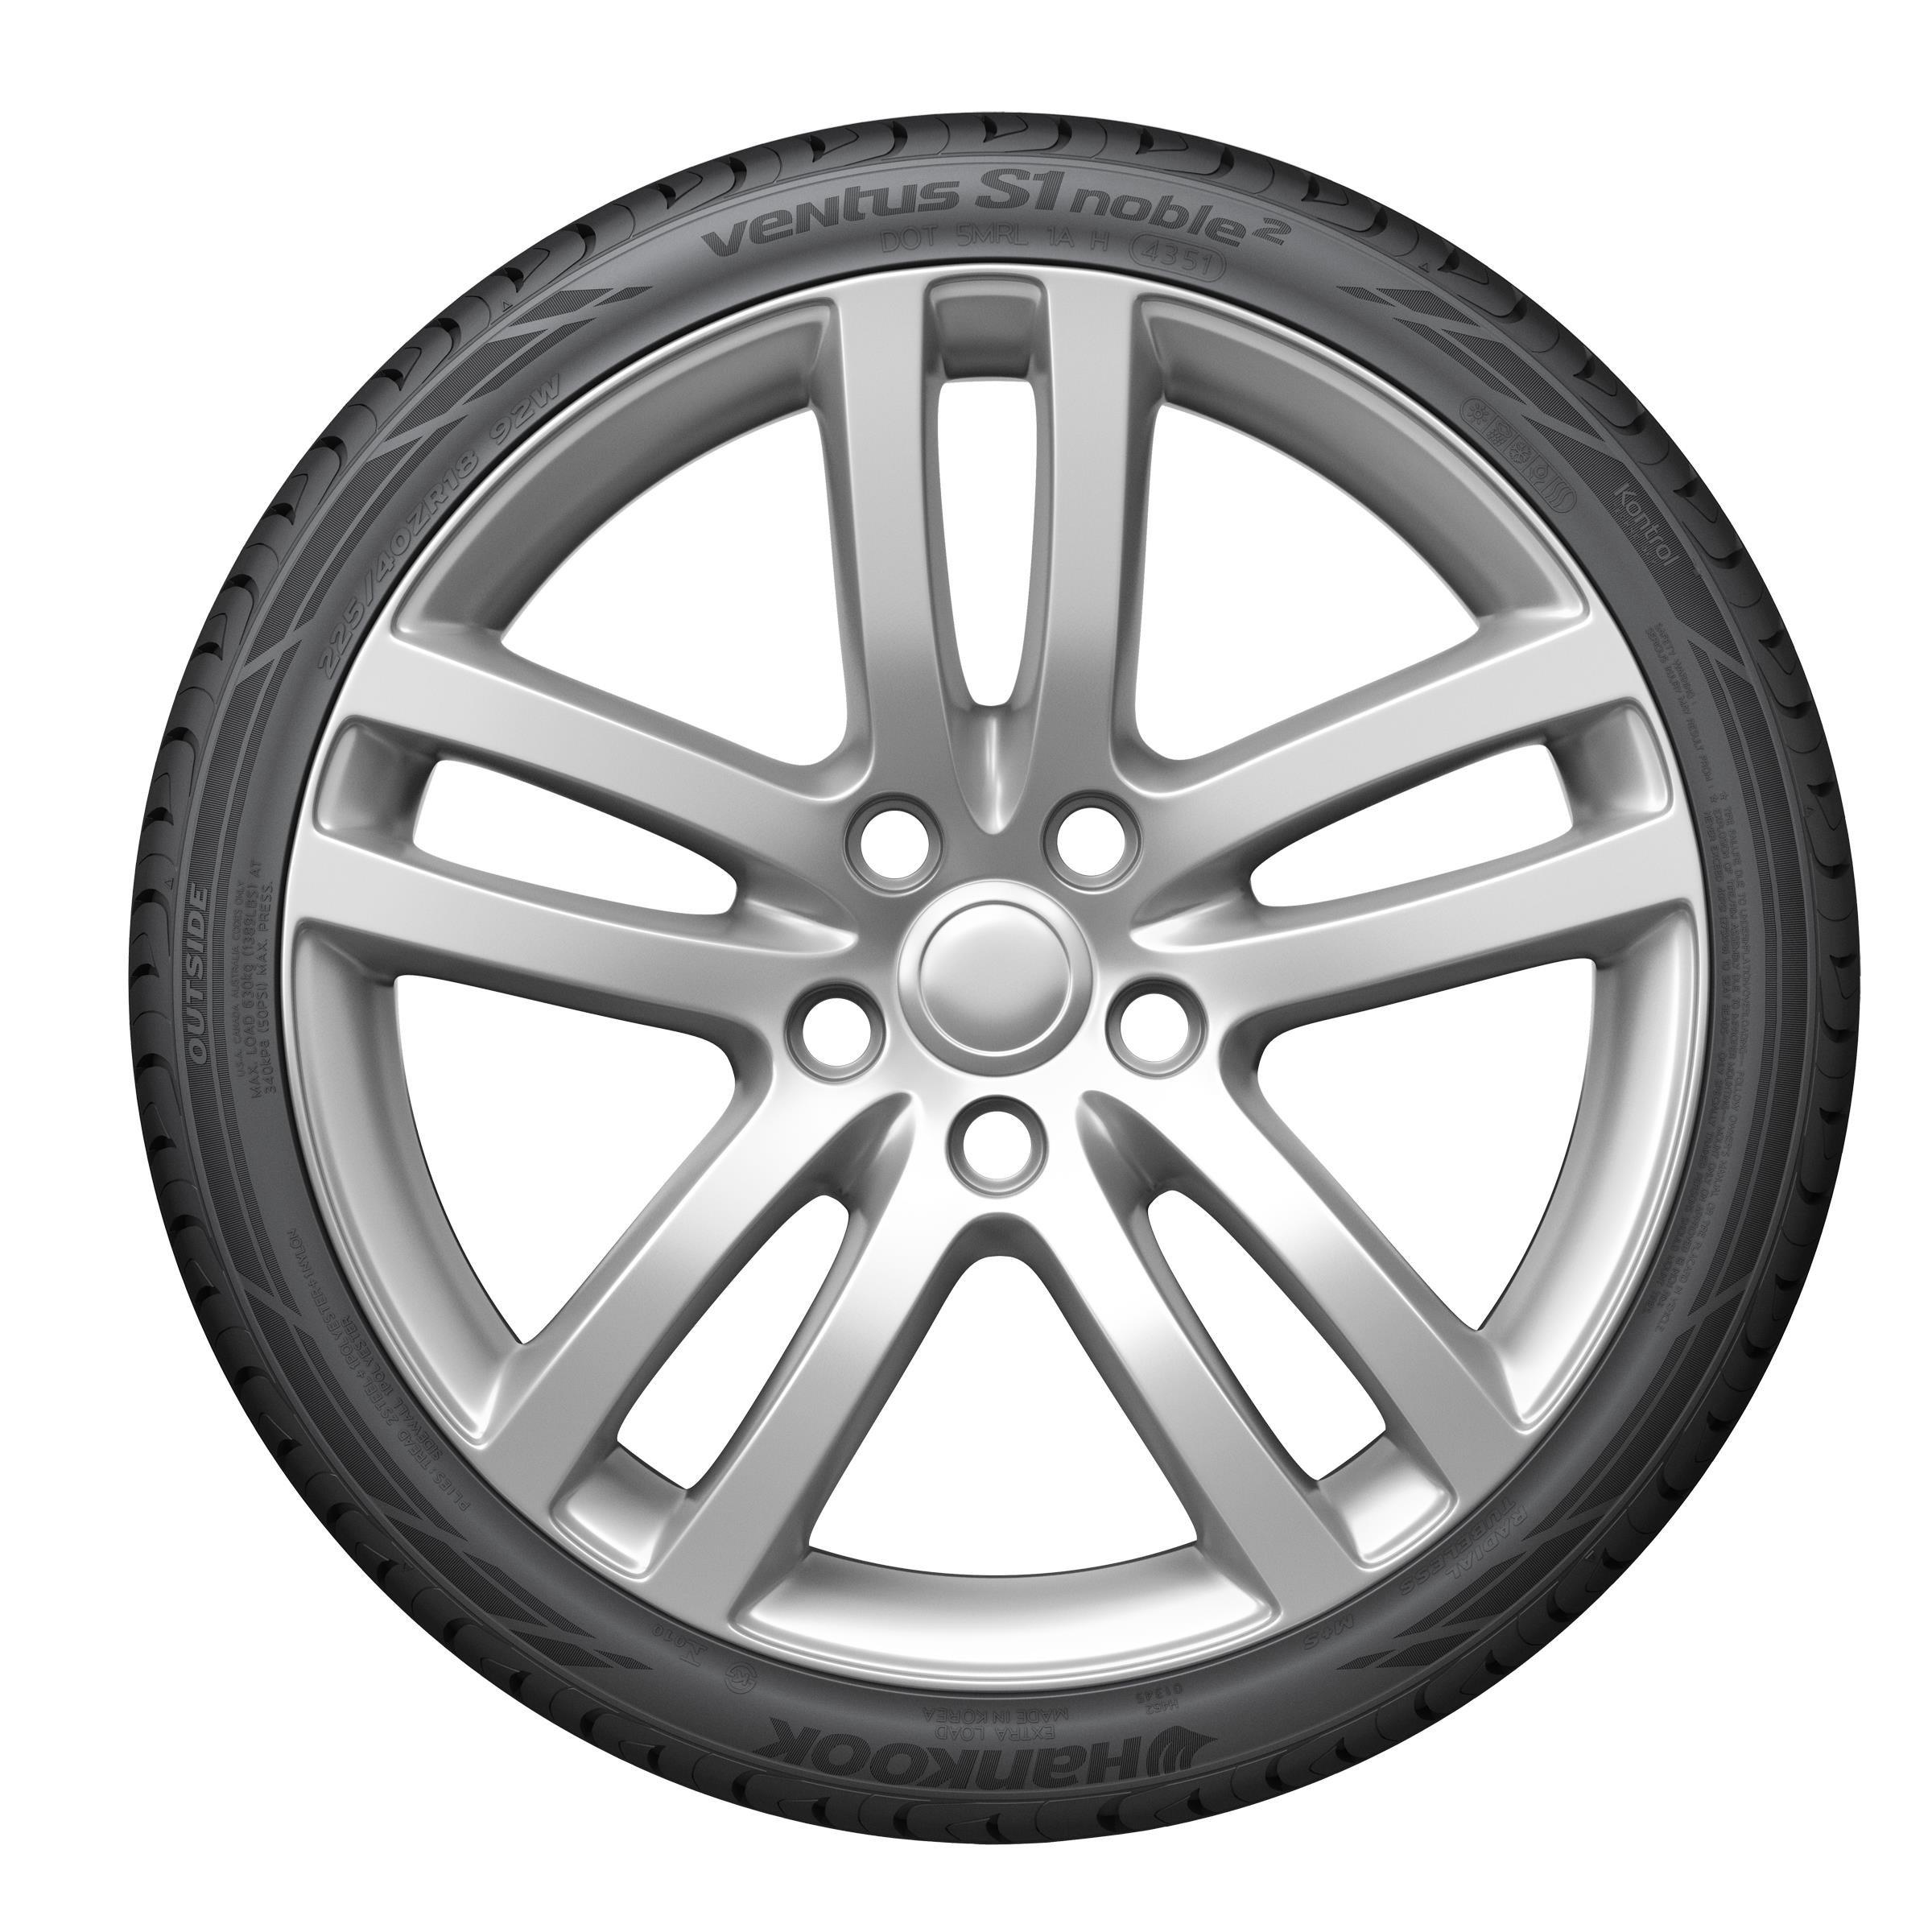 Hankook Ventus S1 Noble2 Performance Radial Tire - 225/40R18 92W by Hankook (Image #1)